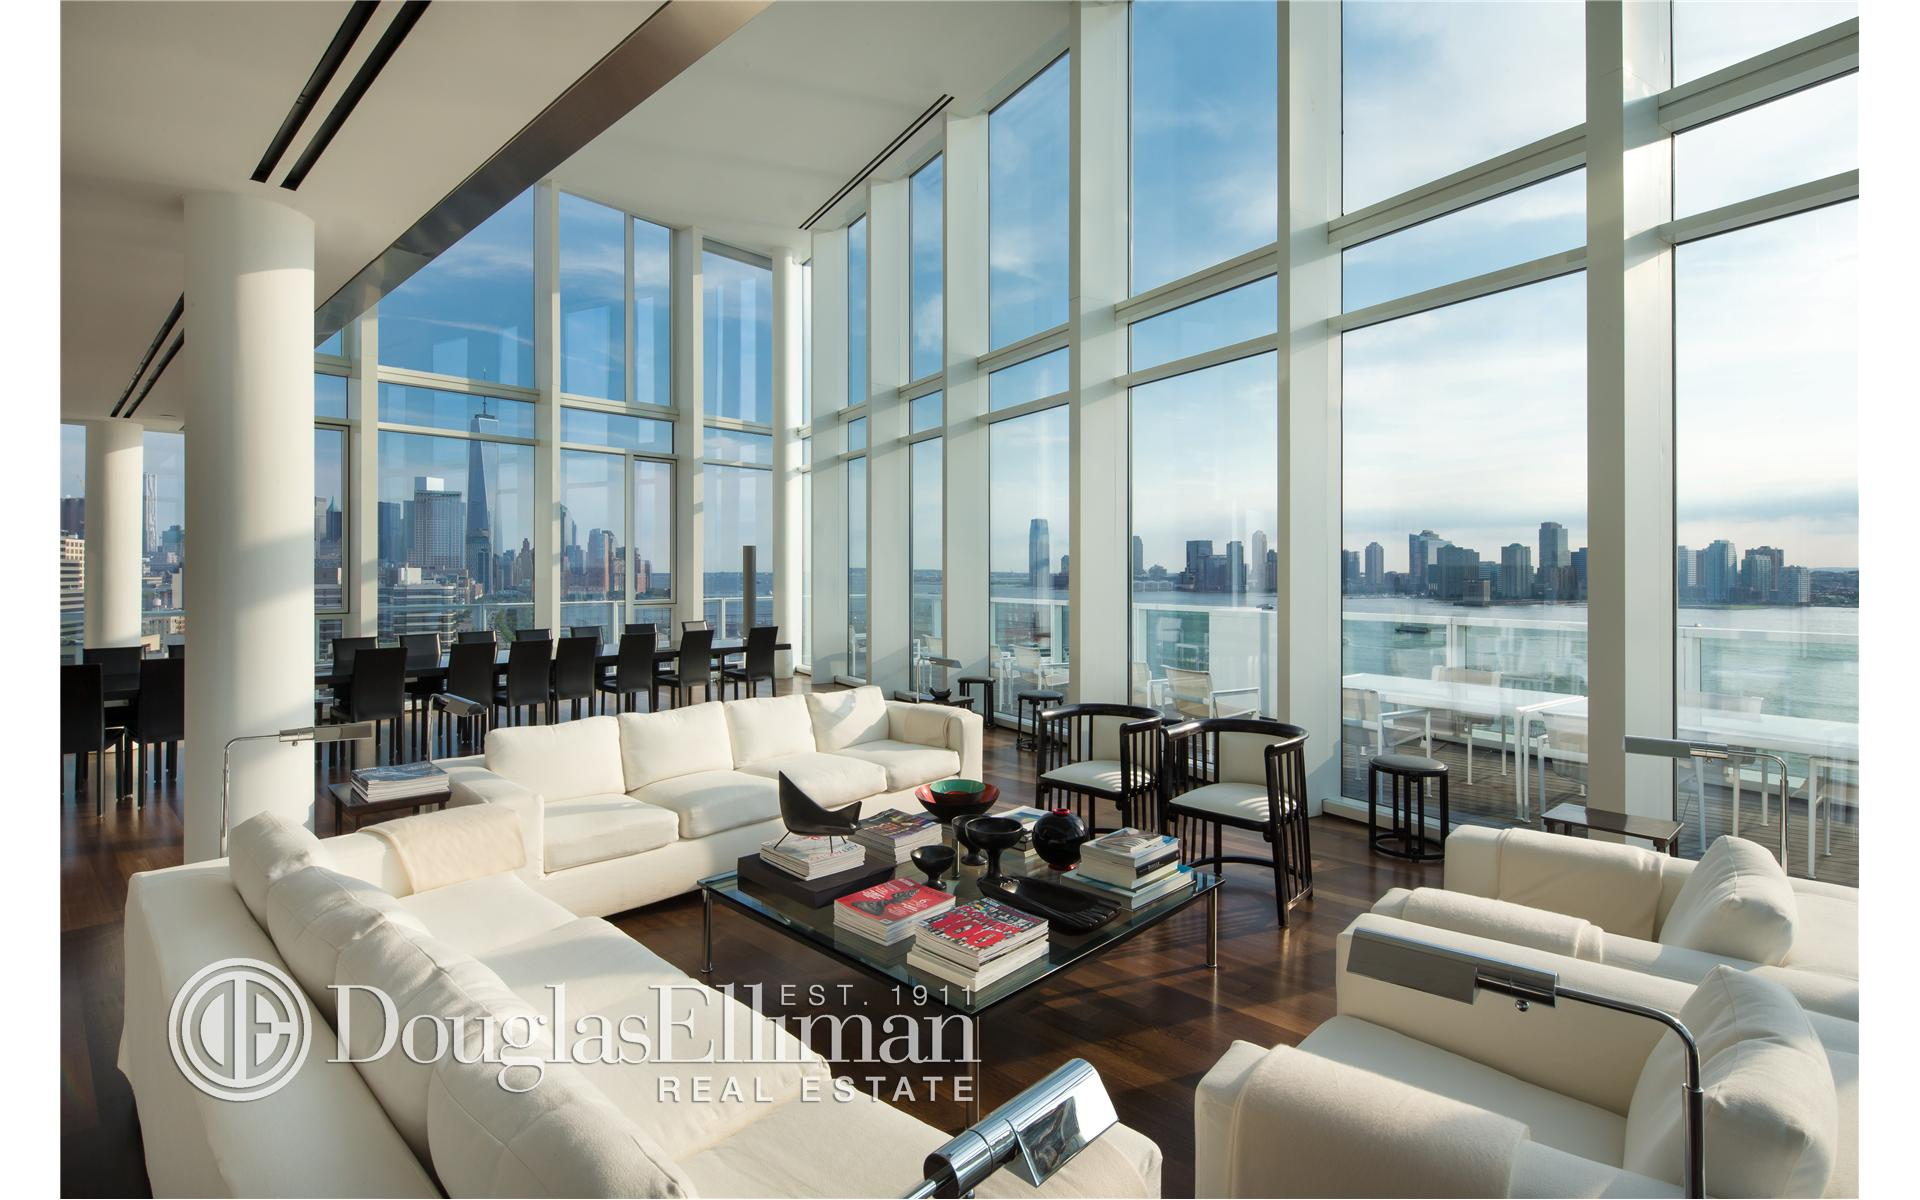 Condominium for Sale at 165 CHARLES STREET, 165 Charles Street New York, New York 10014 United States